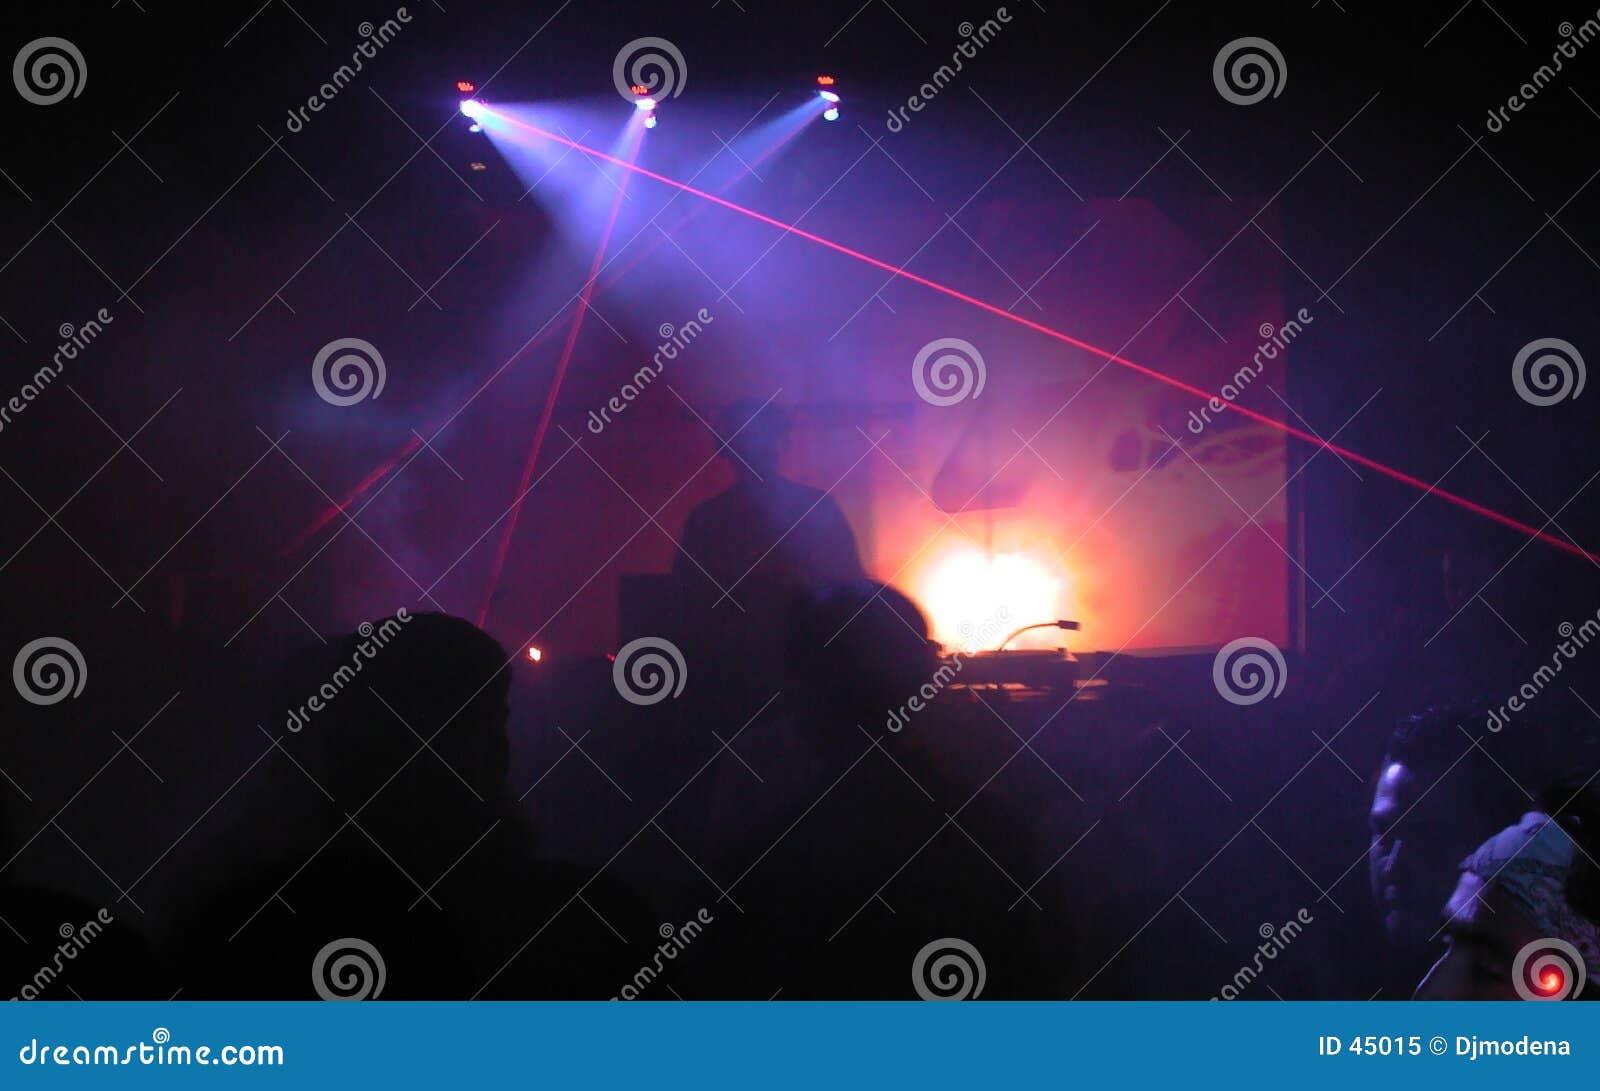 Dj with laser